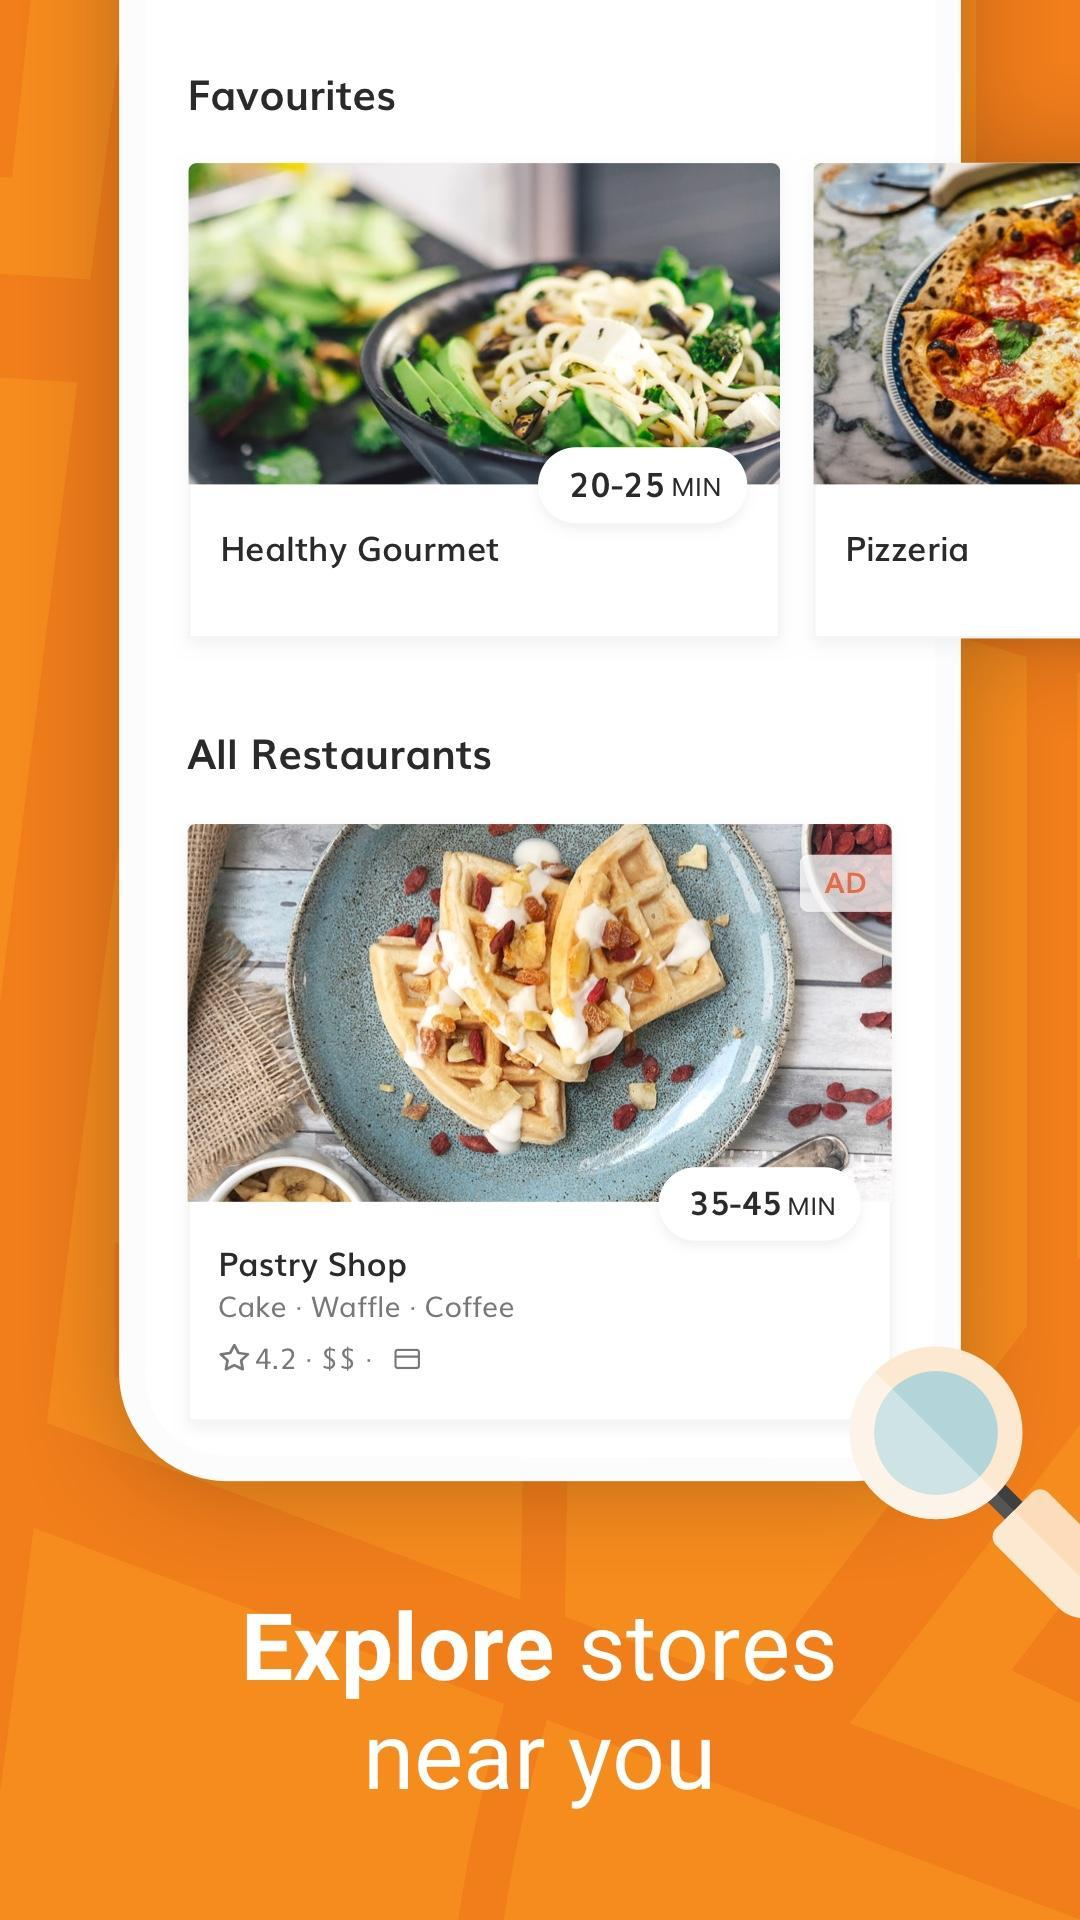 Jumia Food Local Food Delivery near You 4.3.1 Screenshot 3